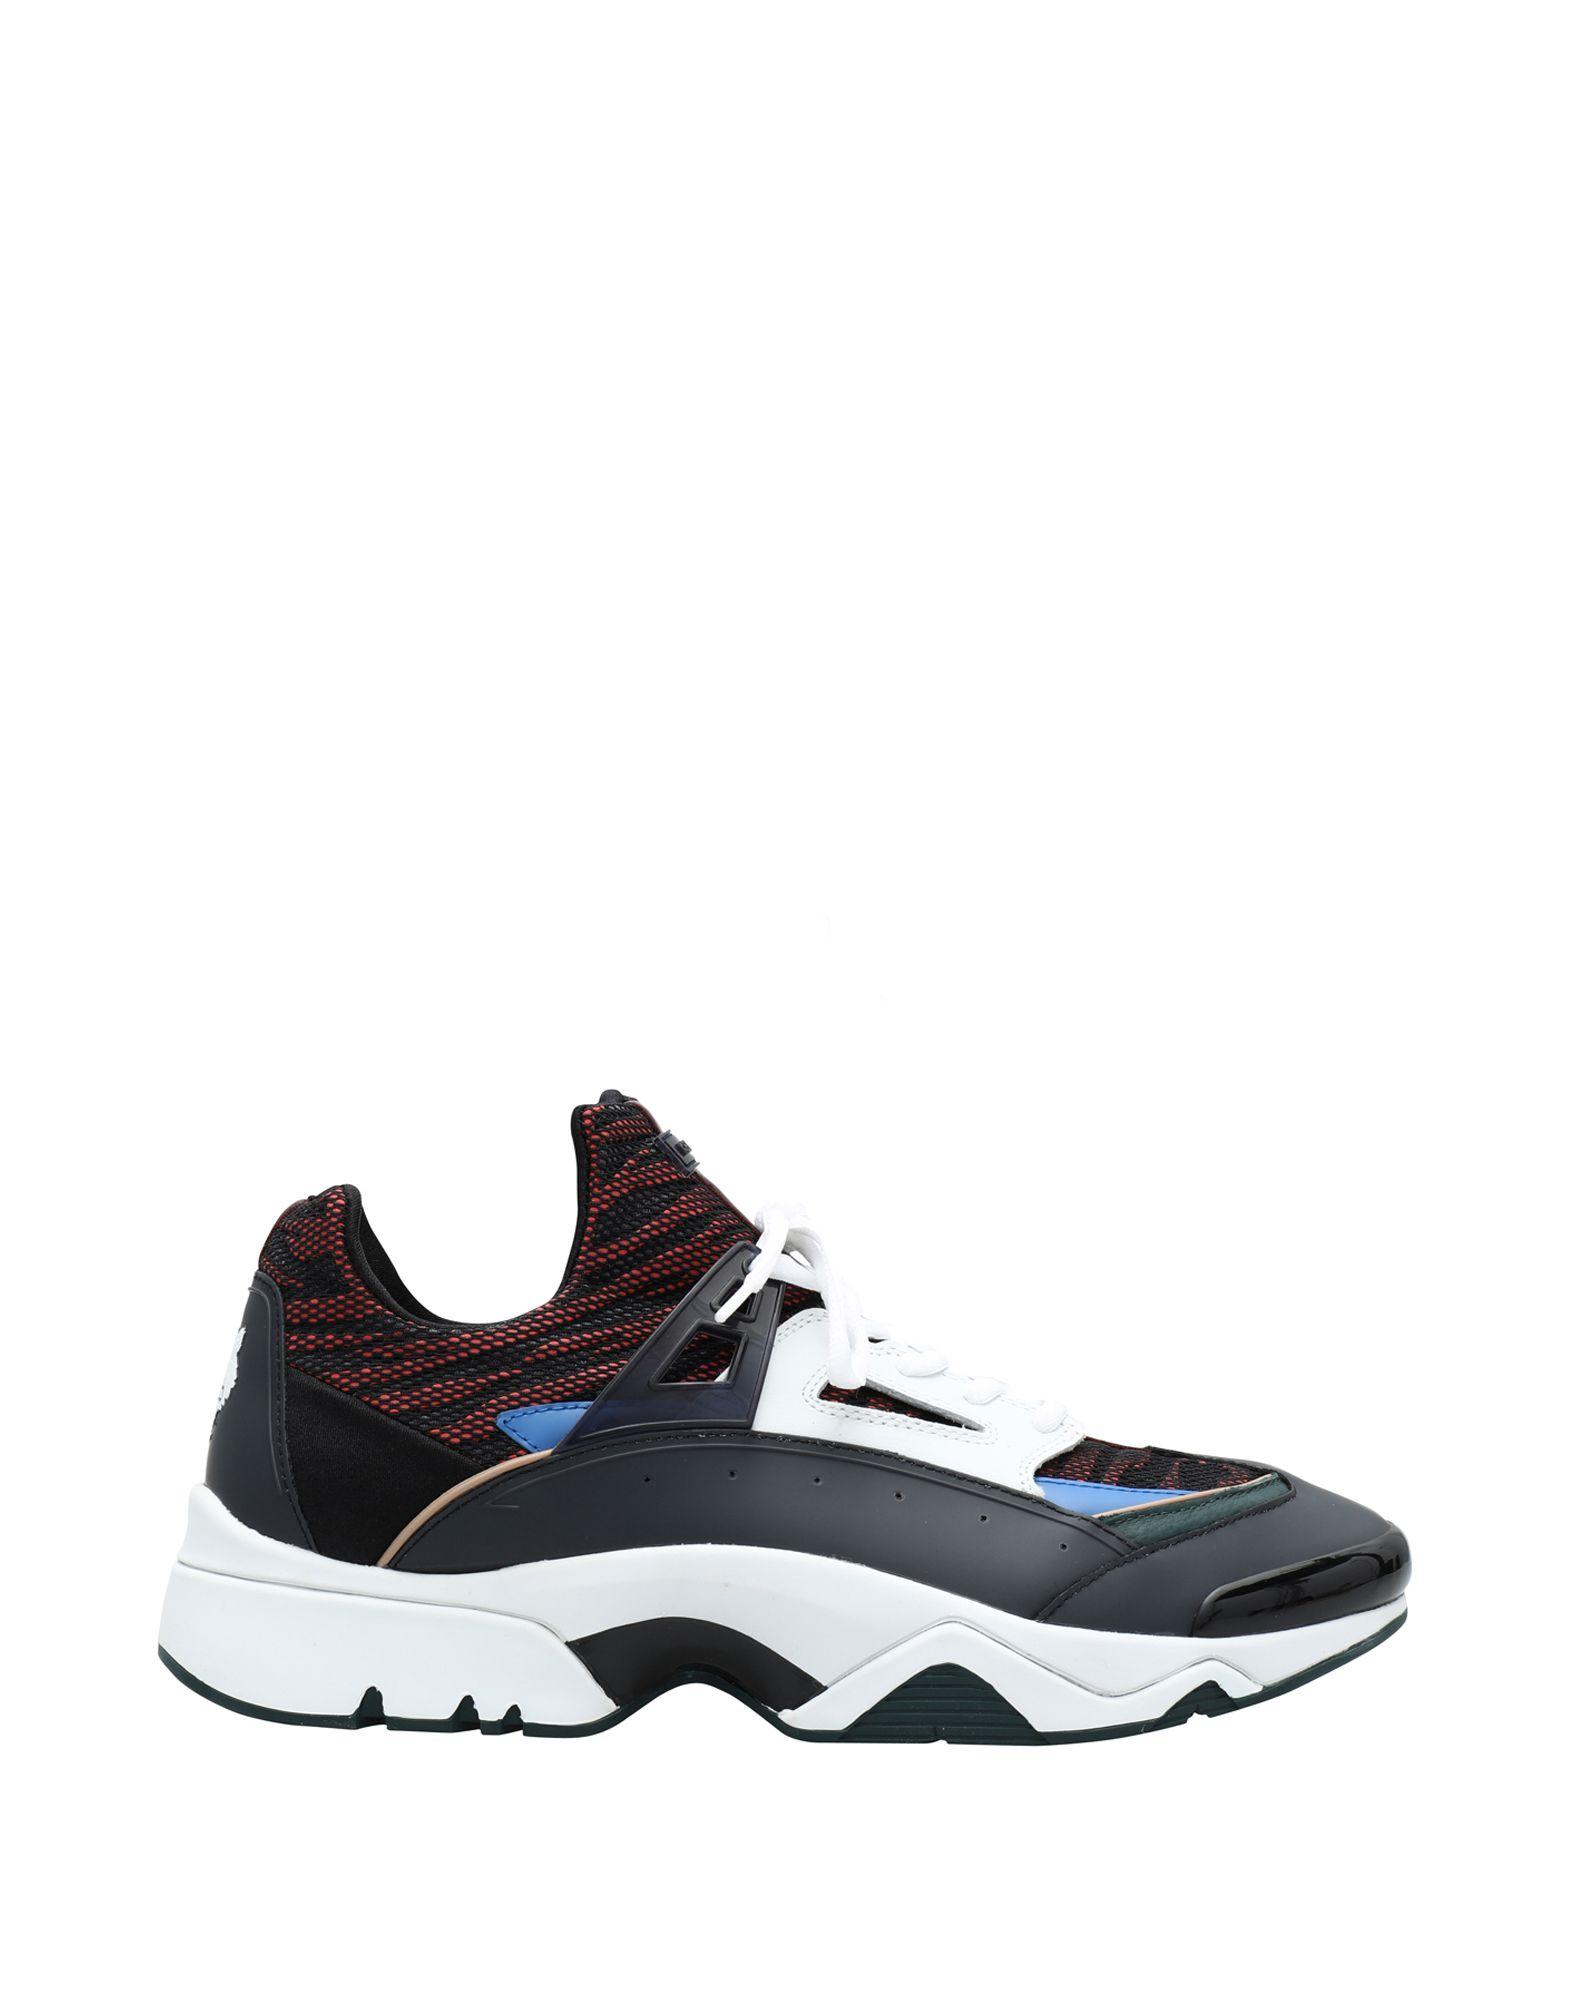 Kenzo Baskets Basses Main - Sneakers online - Men Kenzo Sneakers online Sneakers on  Australia - 11555292NM 7add15